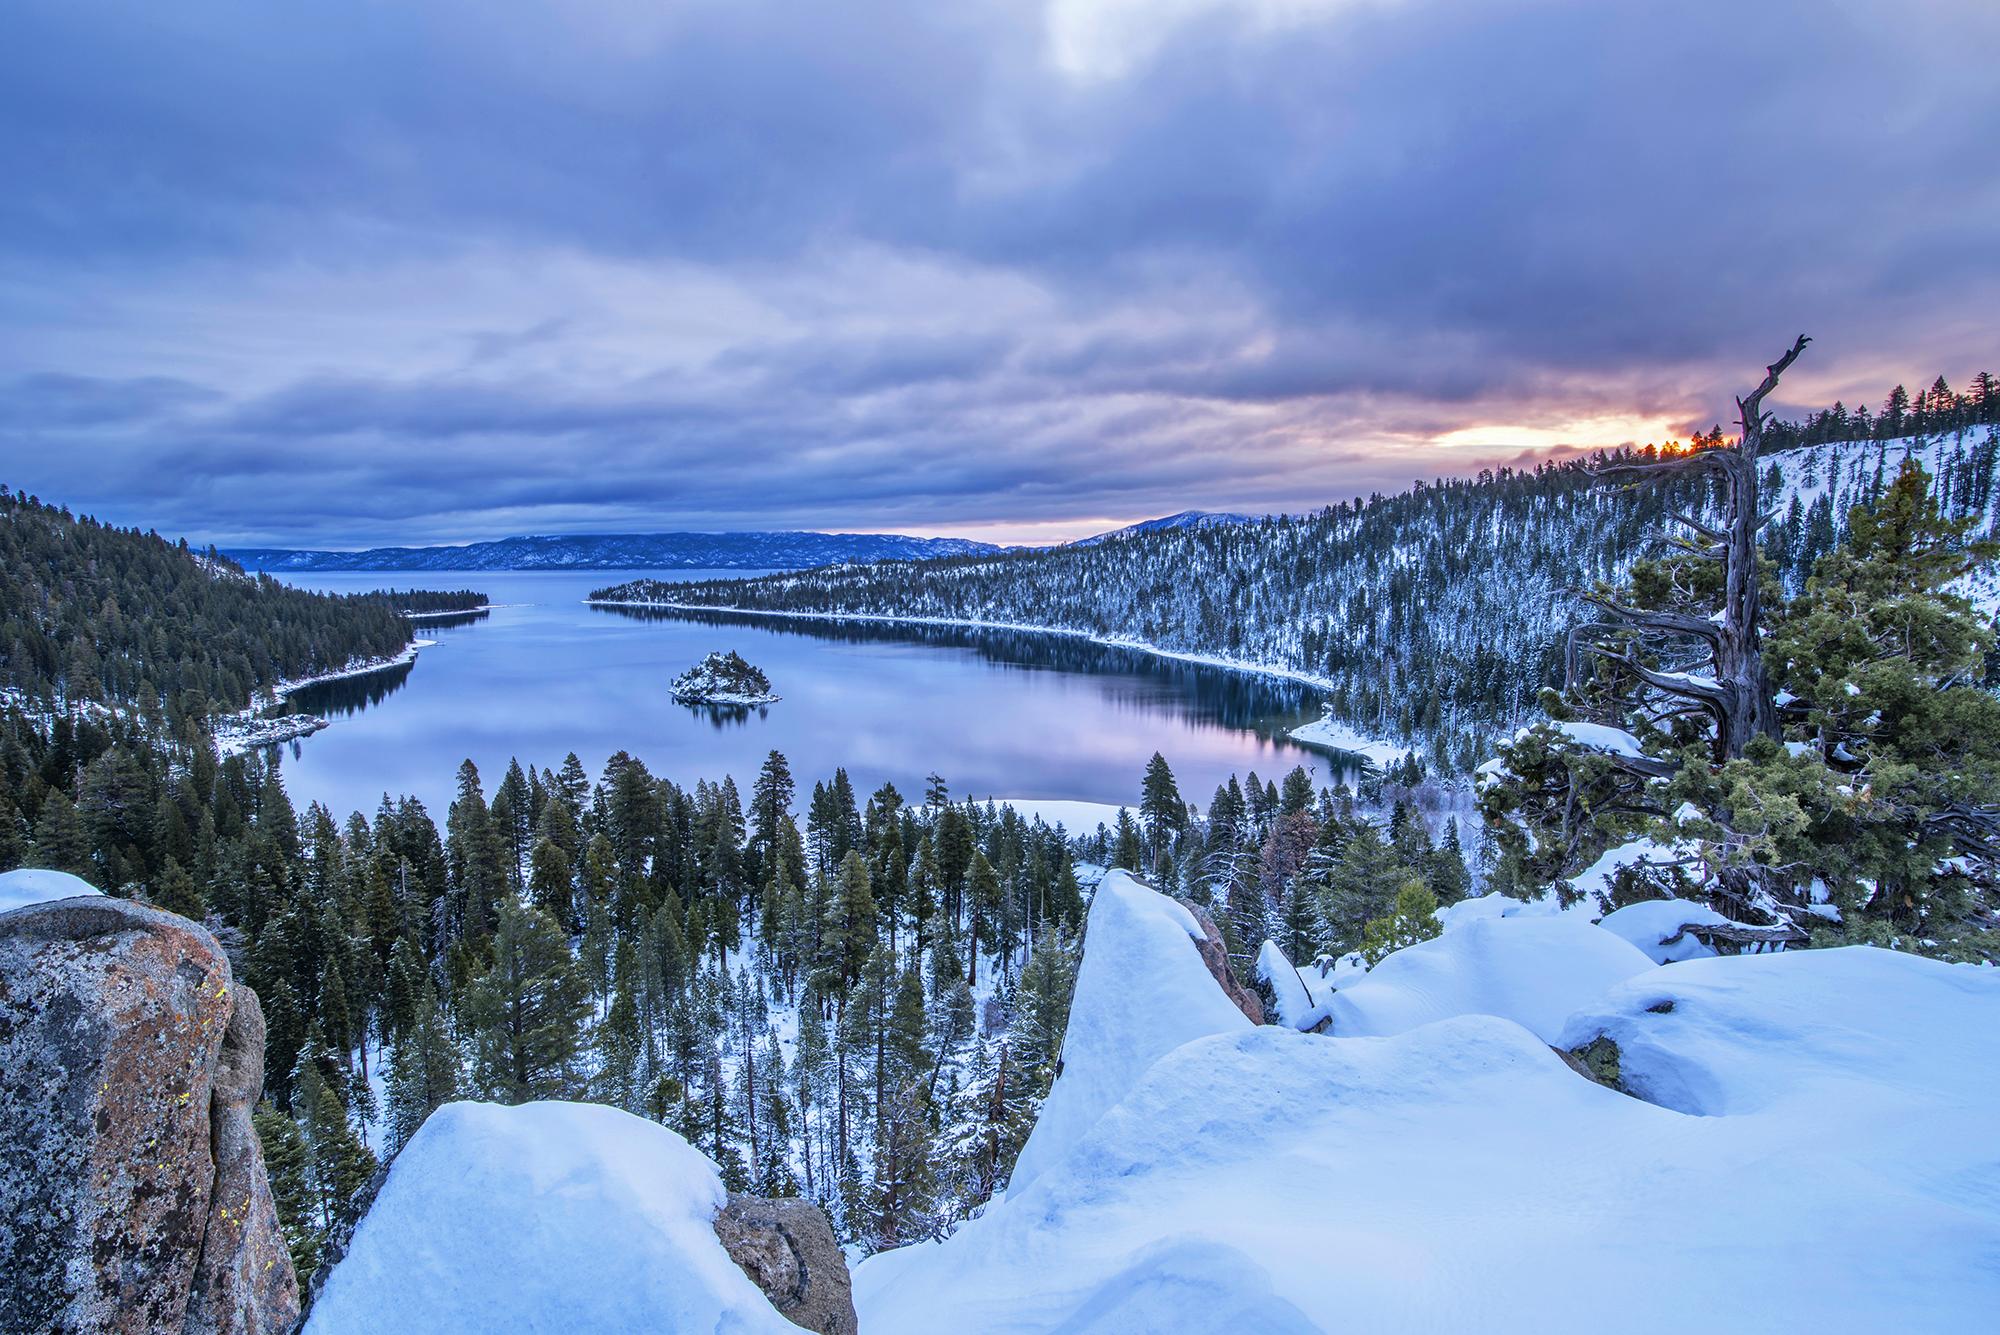 Emerald bay winter sunrise